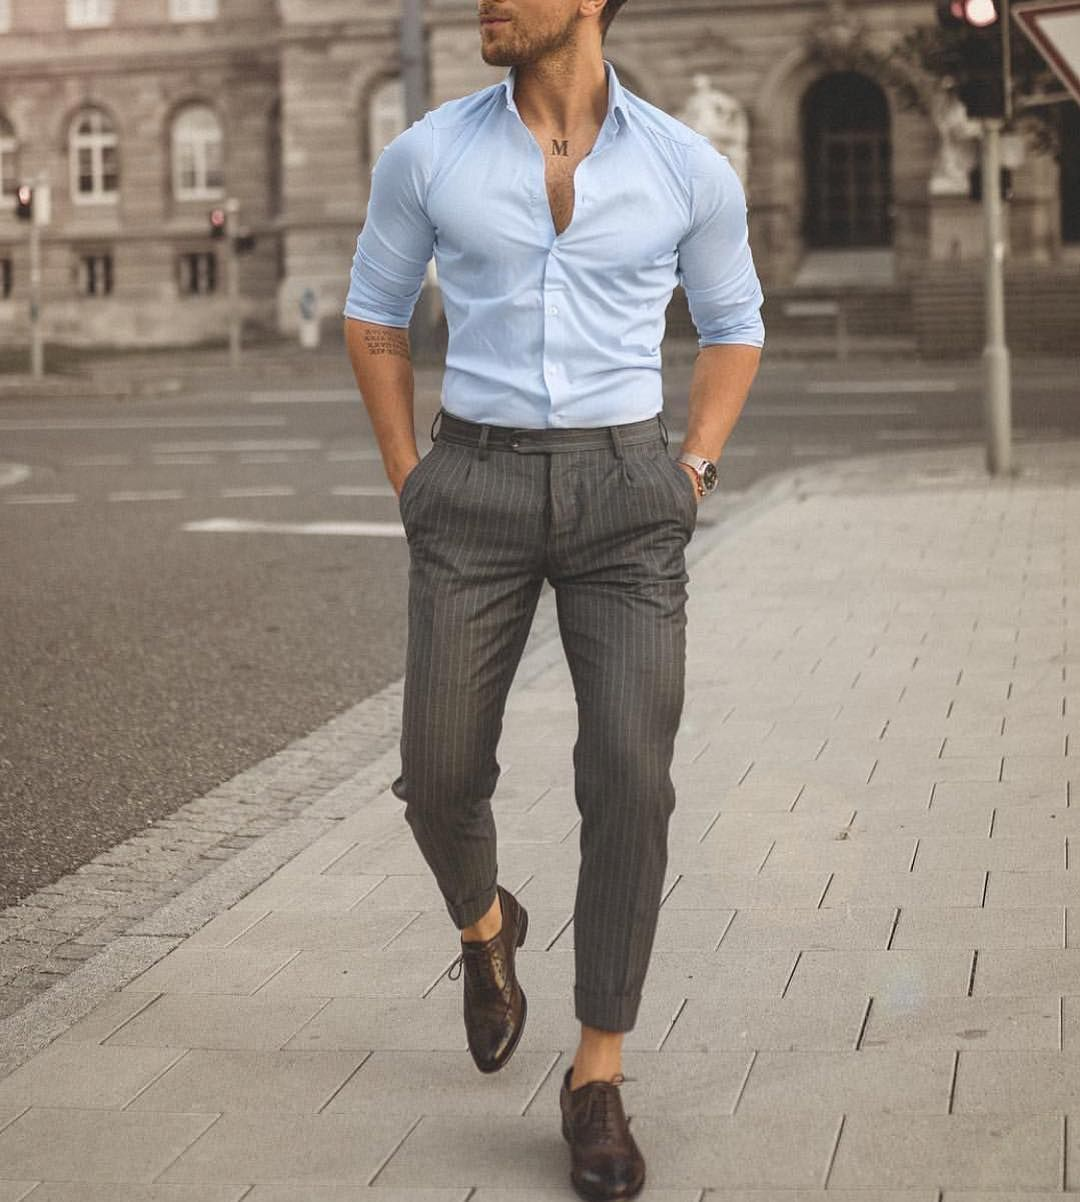 Men with class #menswear cc: menwithclass (com imagens